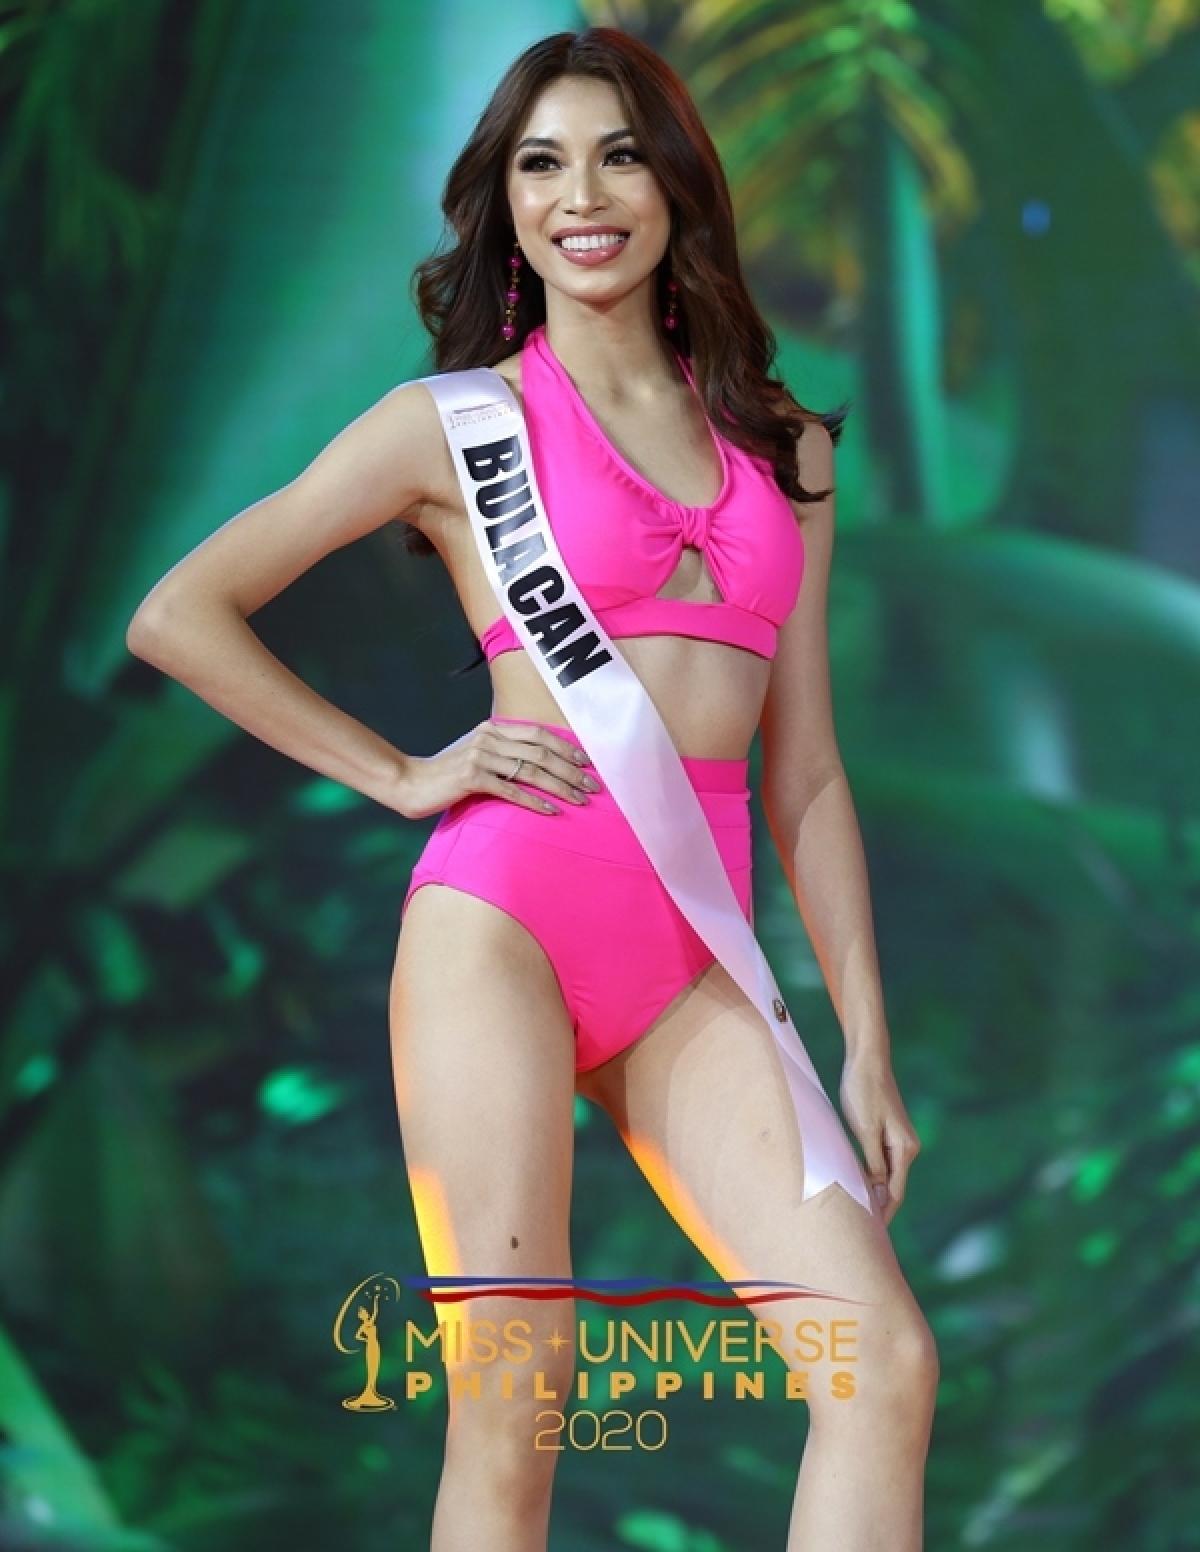 Dianella Louise Loya, 20 tuổi, là đại diện tỉnh Bulacan.